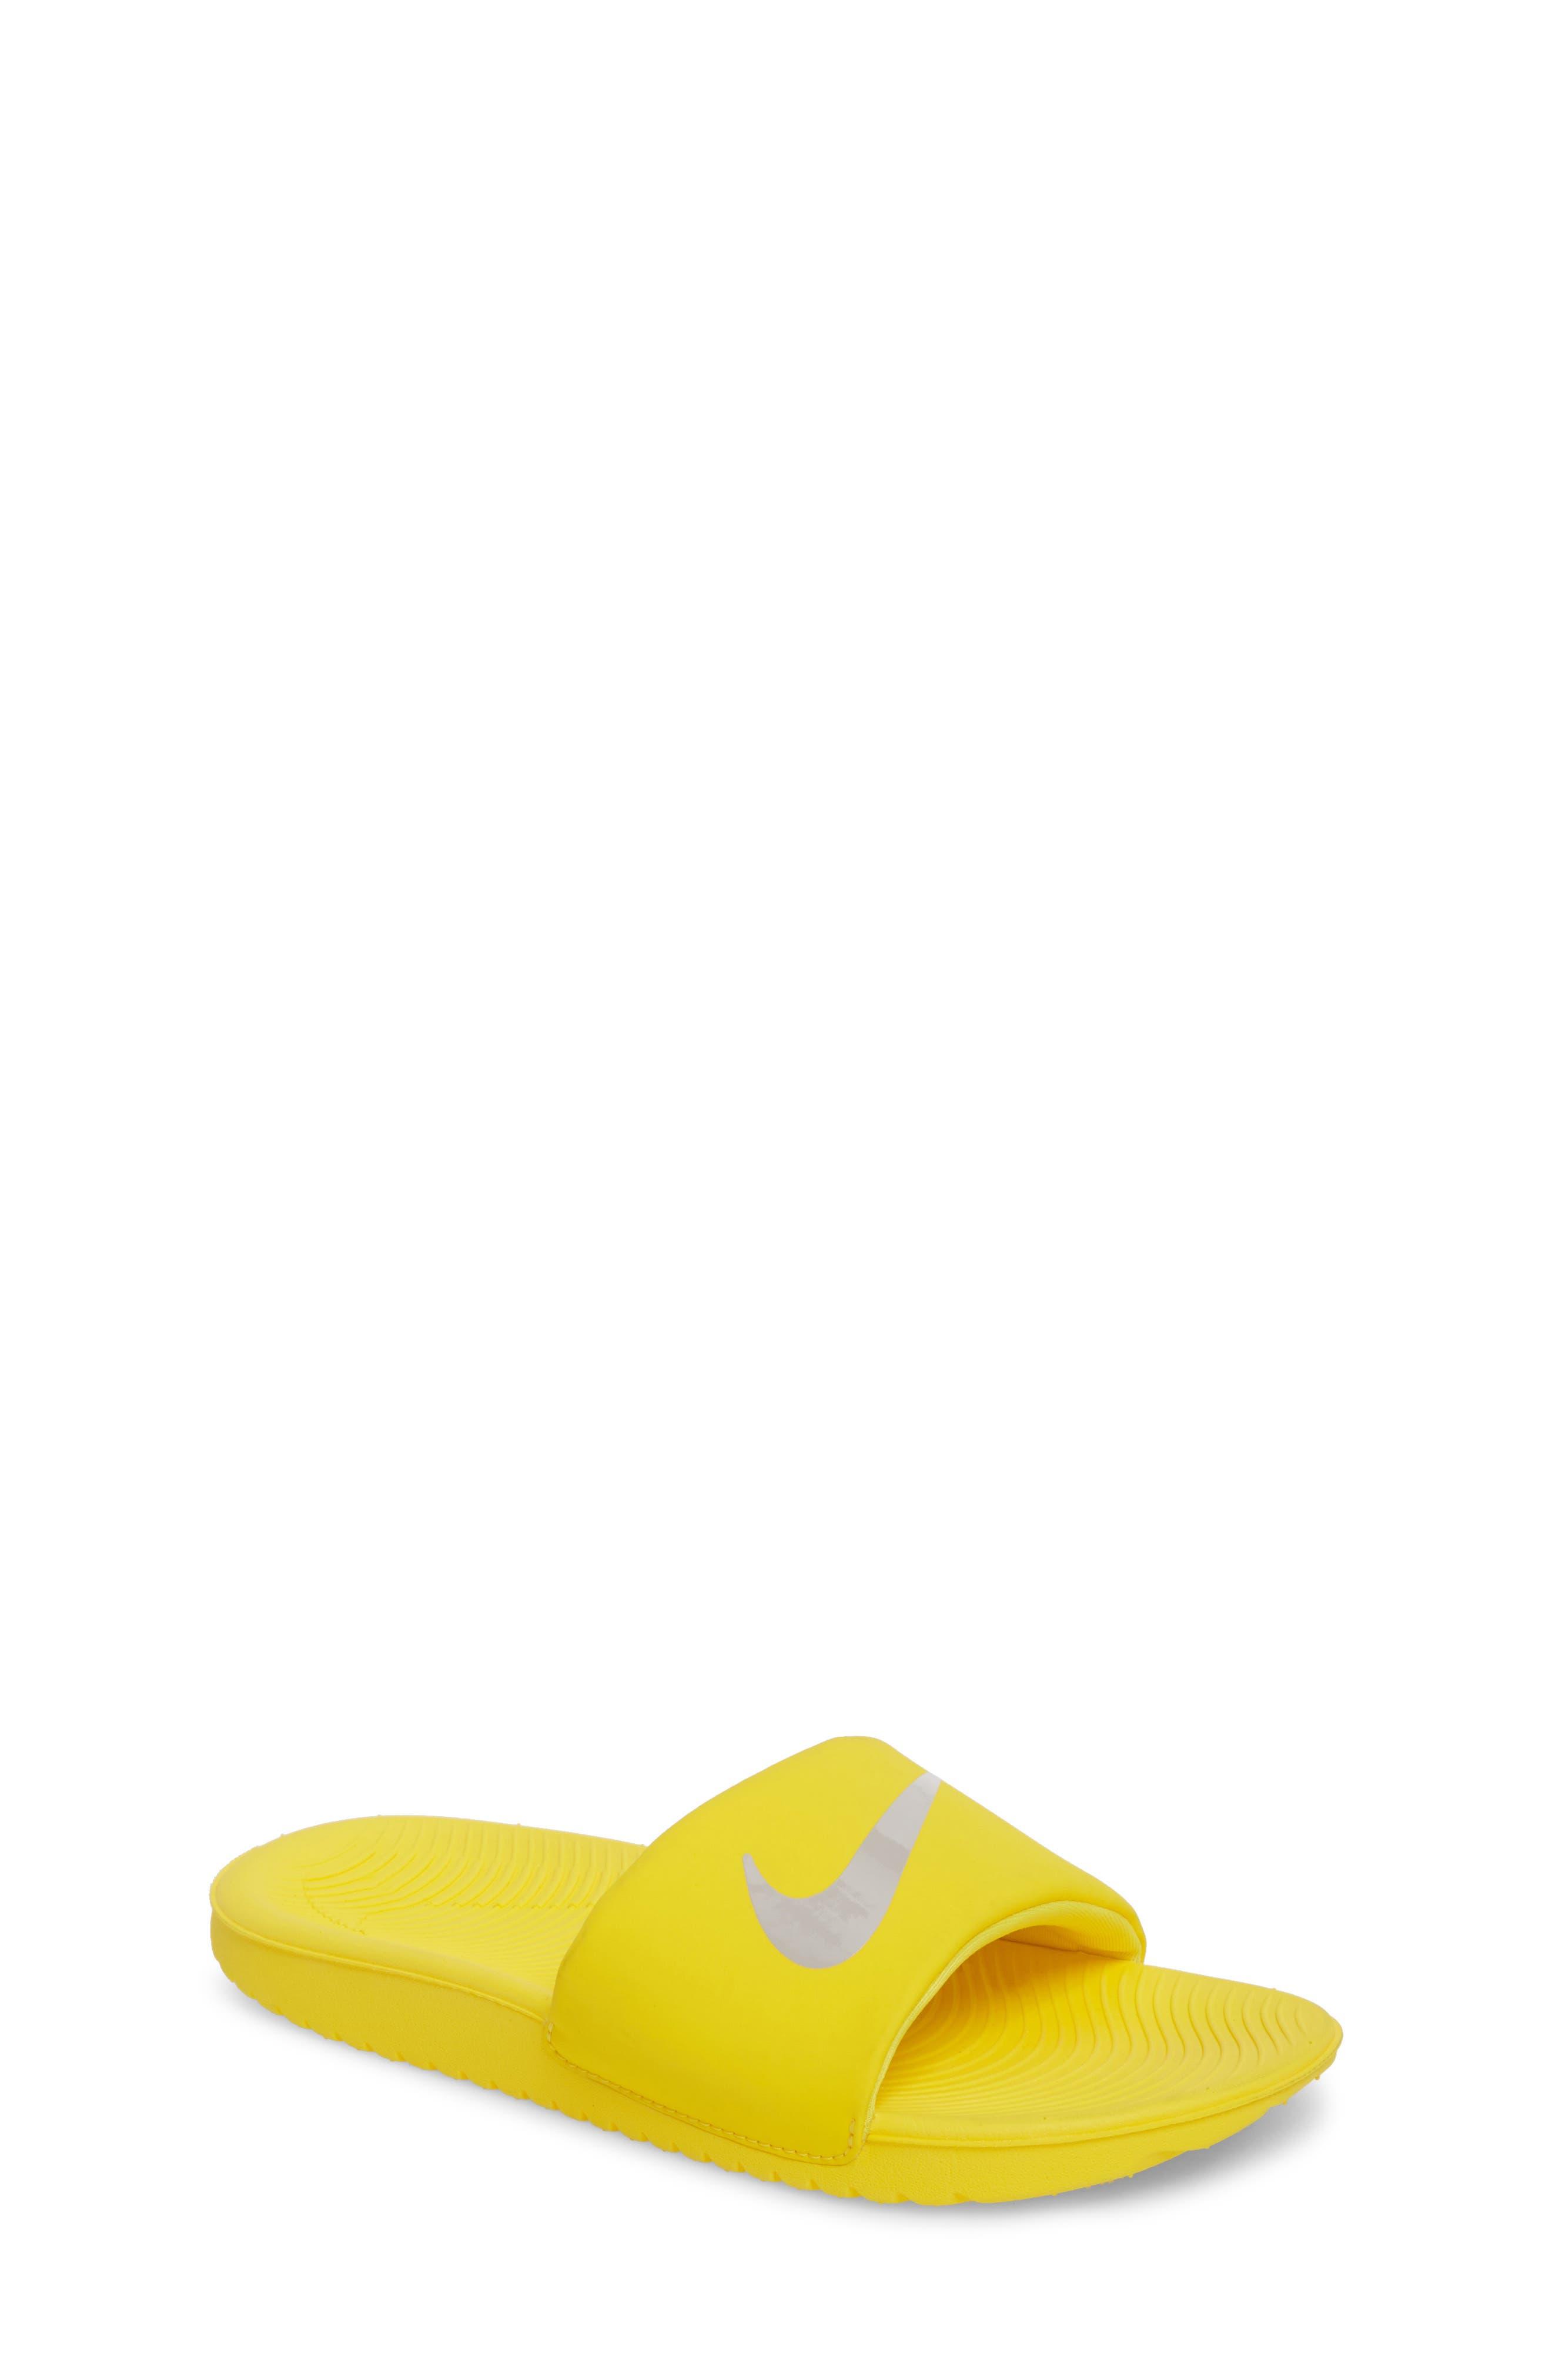 'Kawa' Slide Sandal,                         Main,                         color, Yellow/ Atmosphere Grey